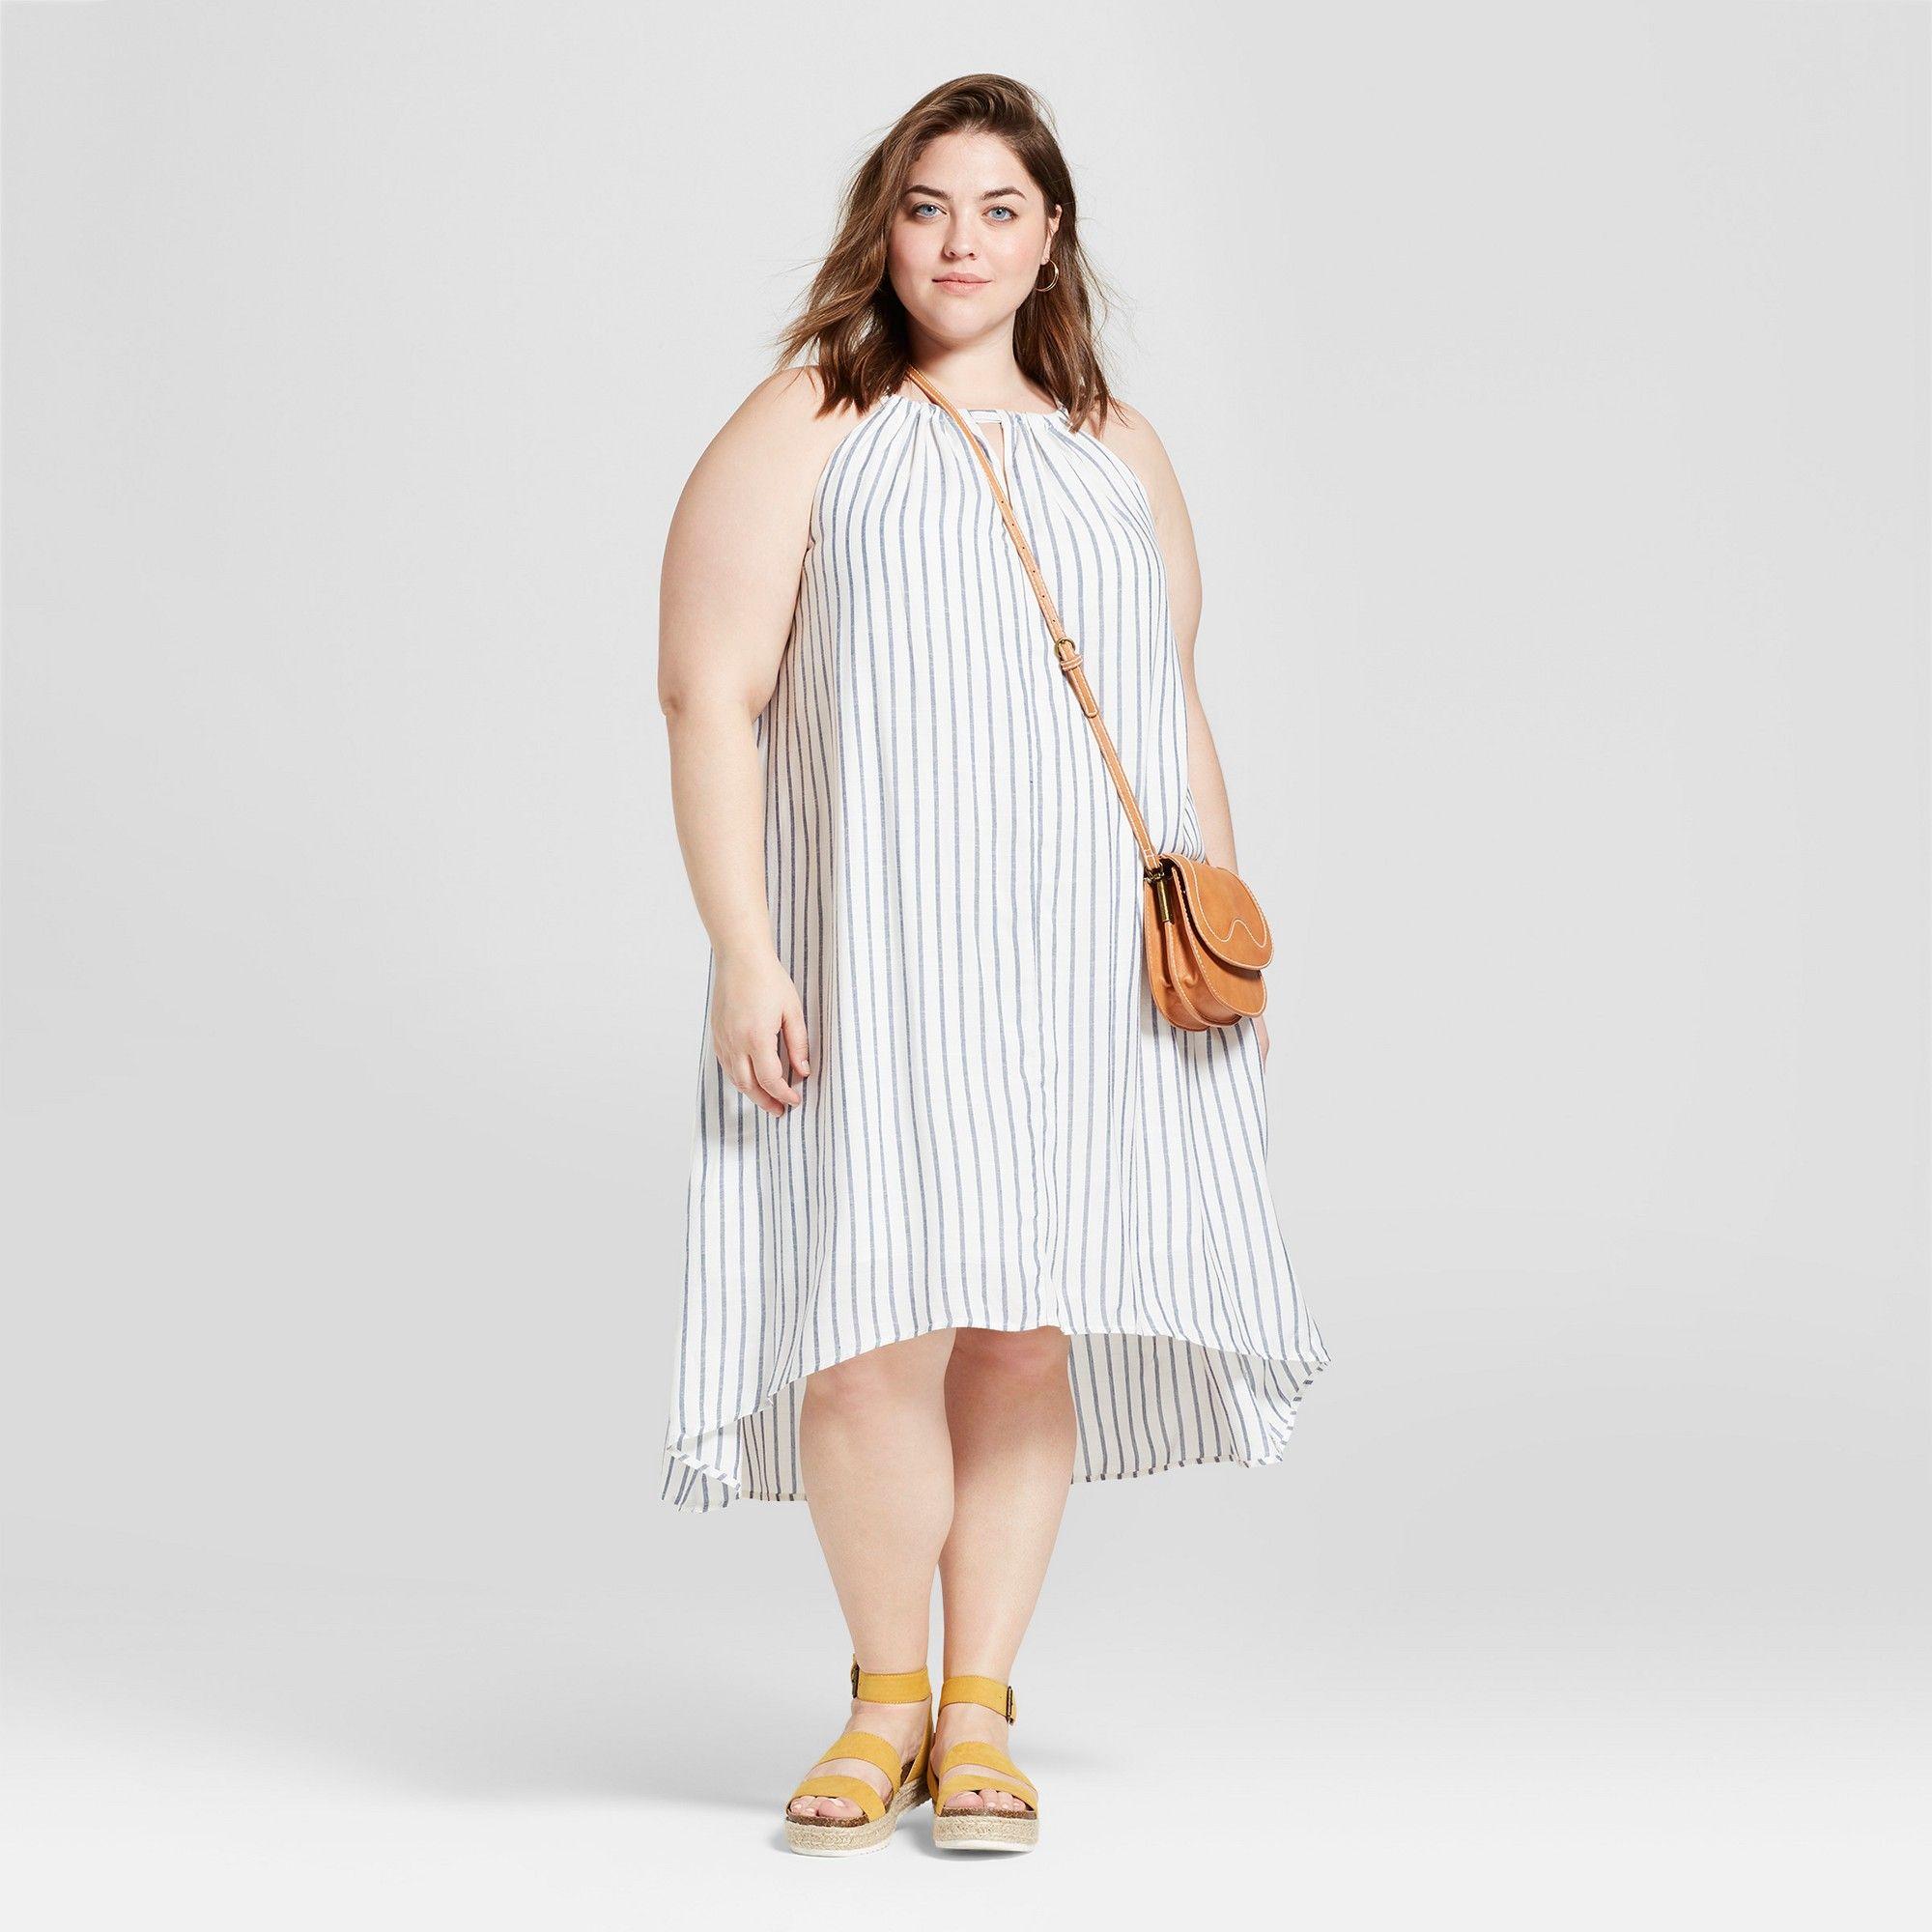 ee7eefe5d6398 Women's Plus Size High Neck Swing Dress - Universal Thread Navy 4X, Blue